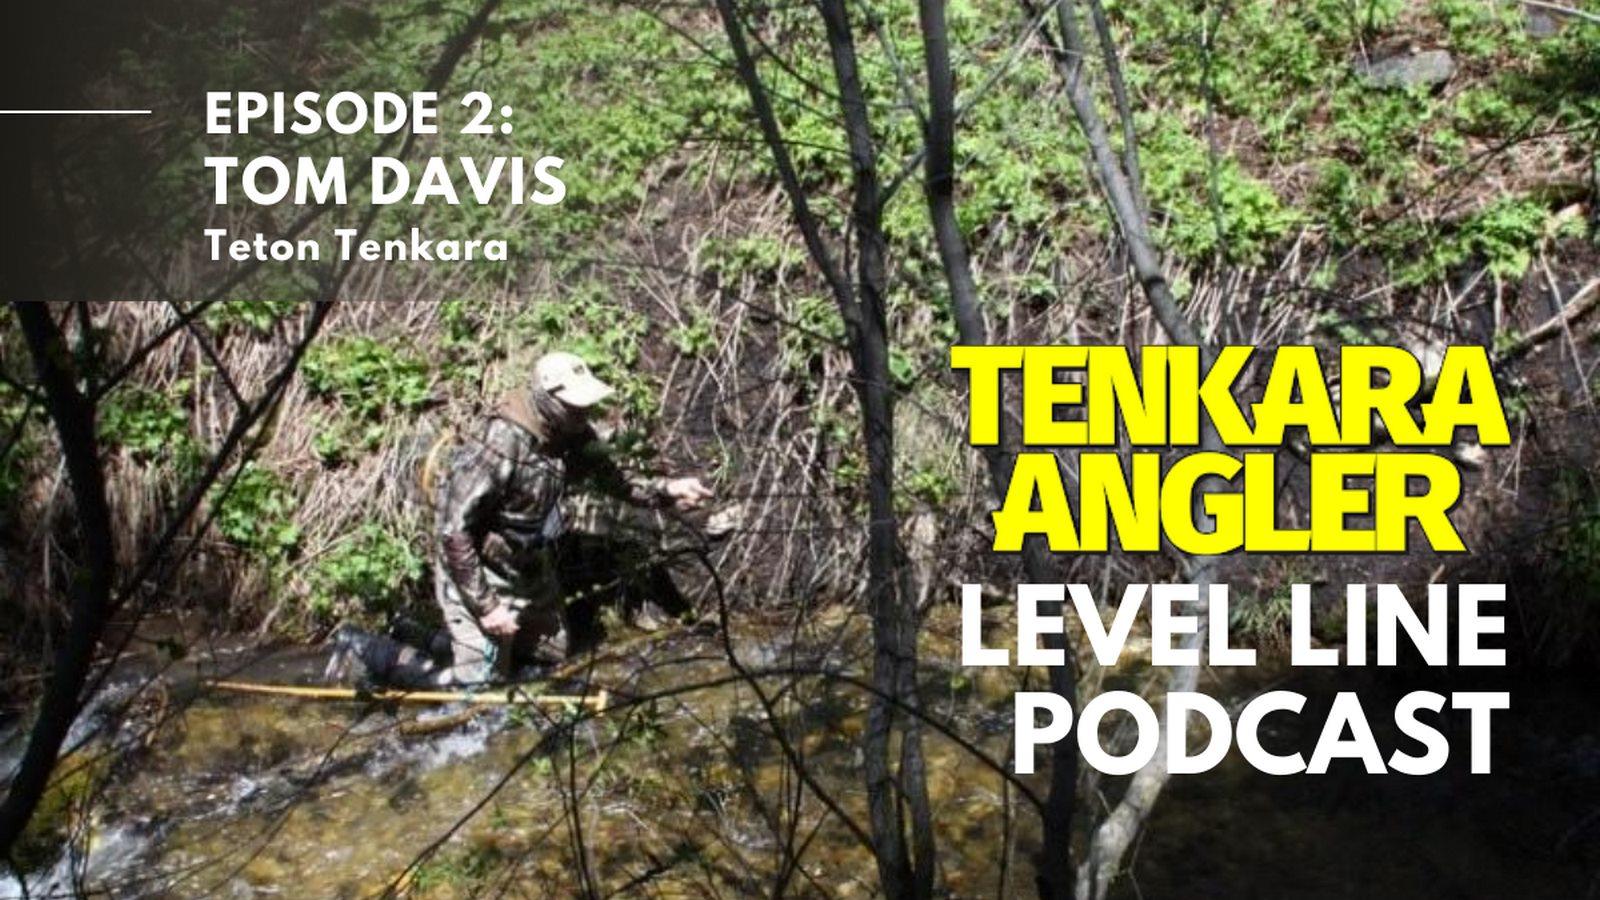 Tom Davis Teton Tenkara - Tenkara Angler Level Line Podcast - Episode 2